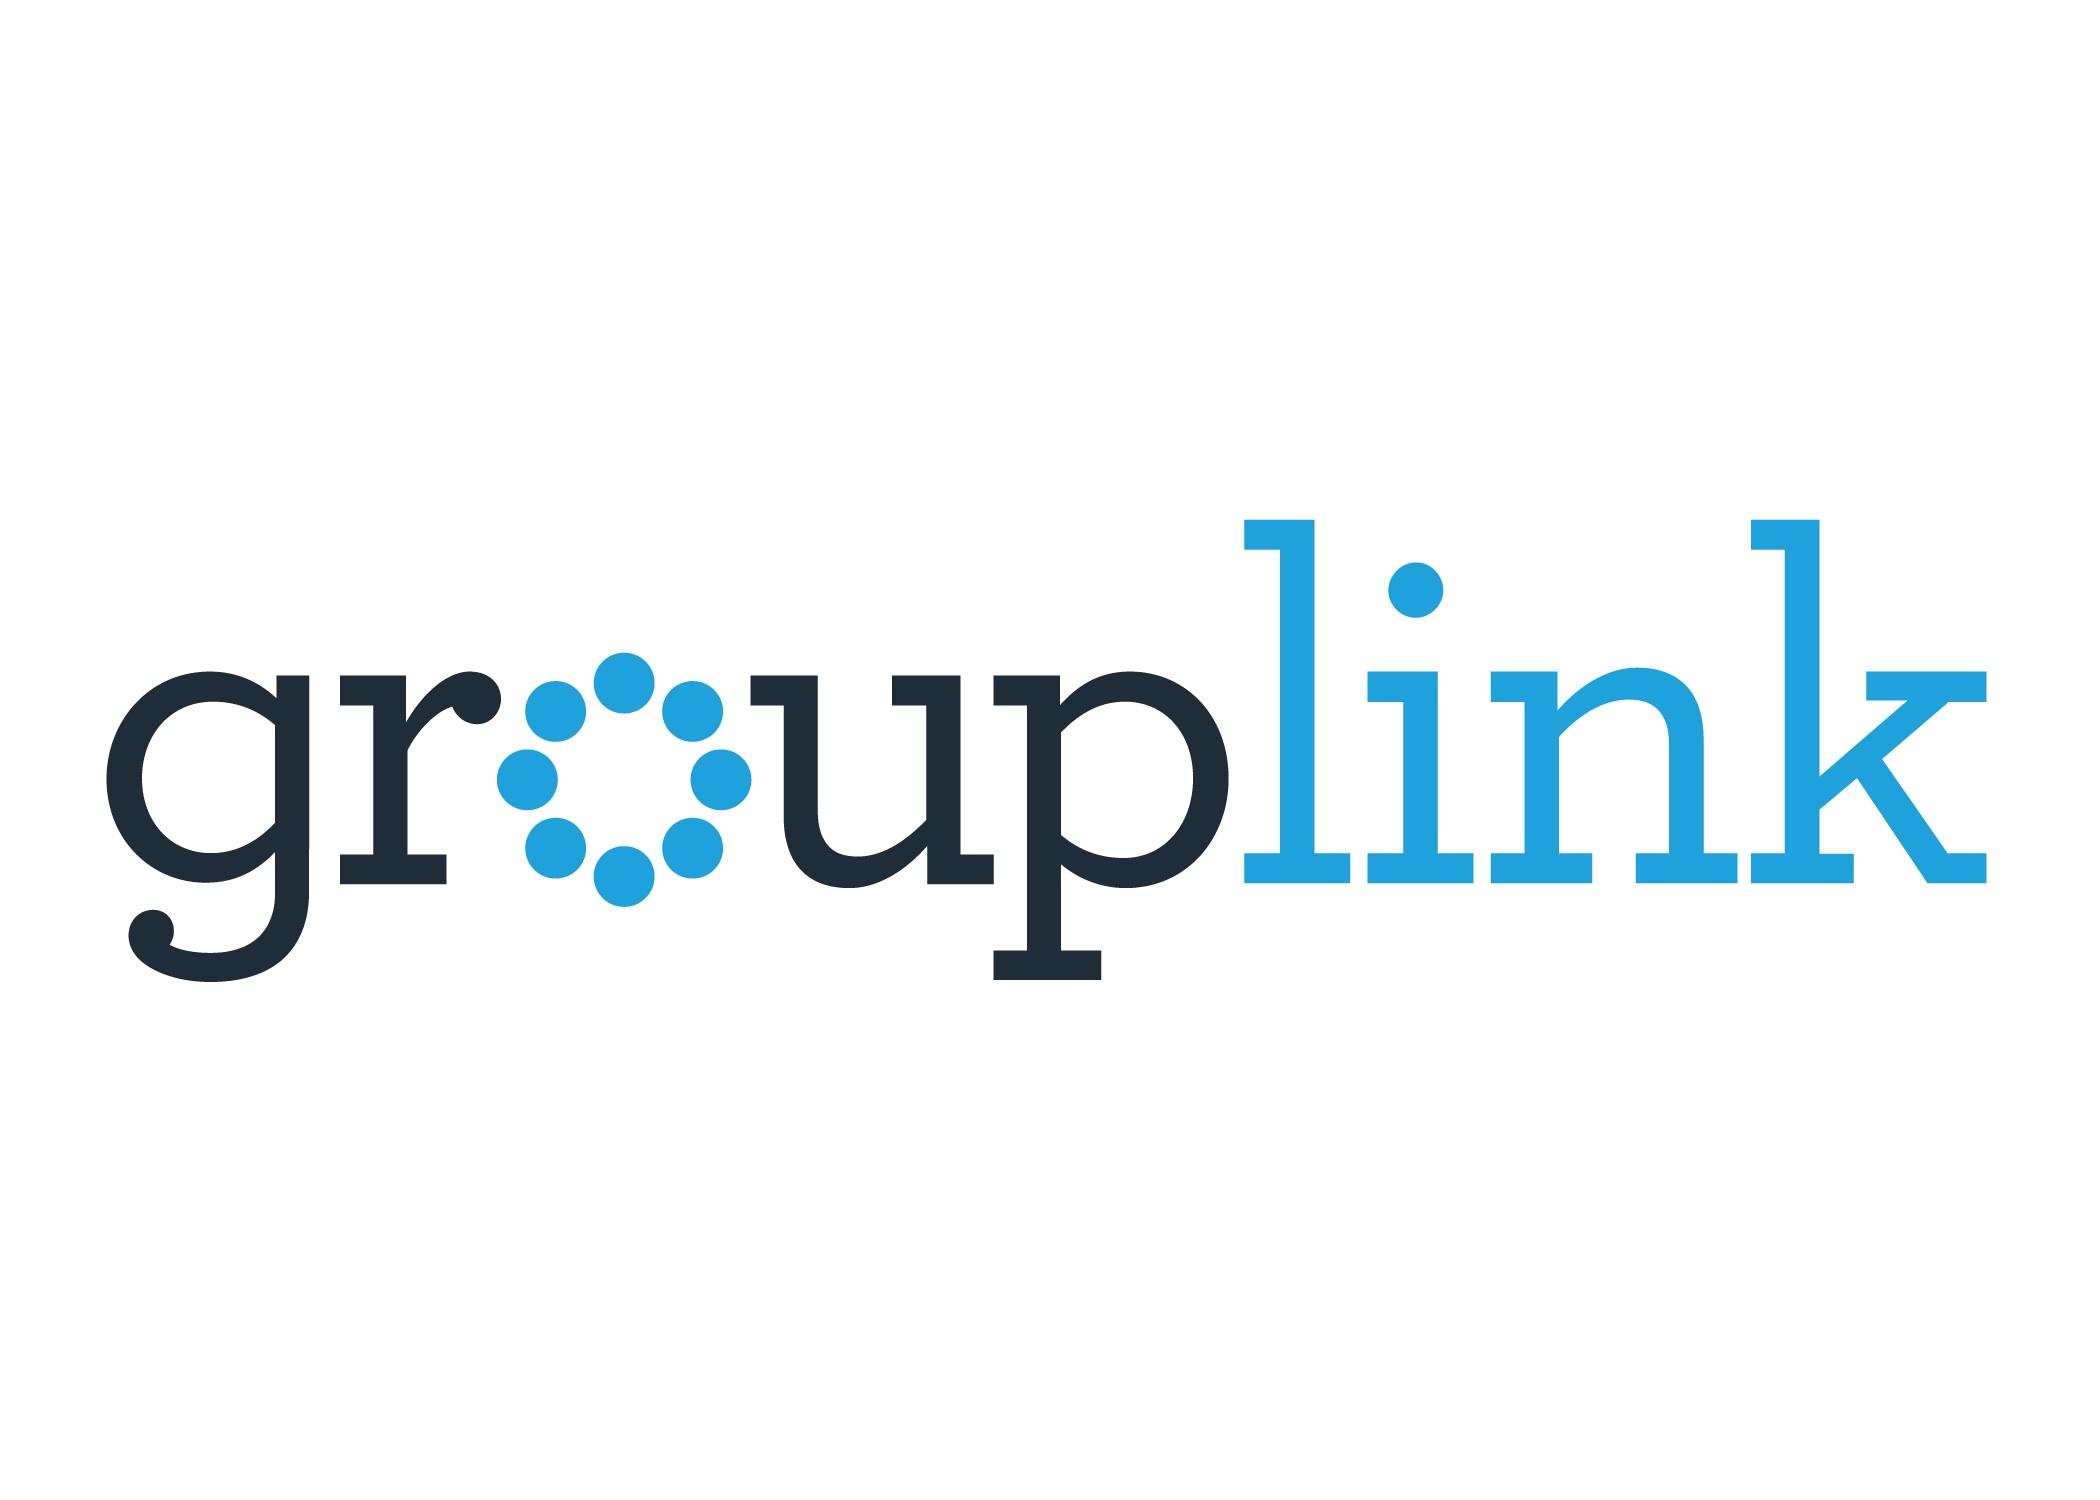 5b6361315c9e911aaa52eb88_GroupLink-Logo.jpg